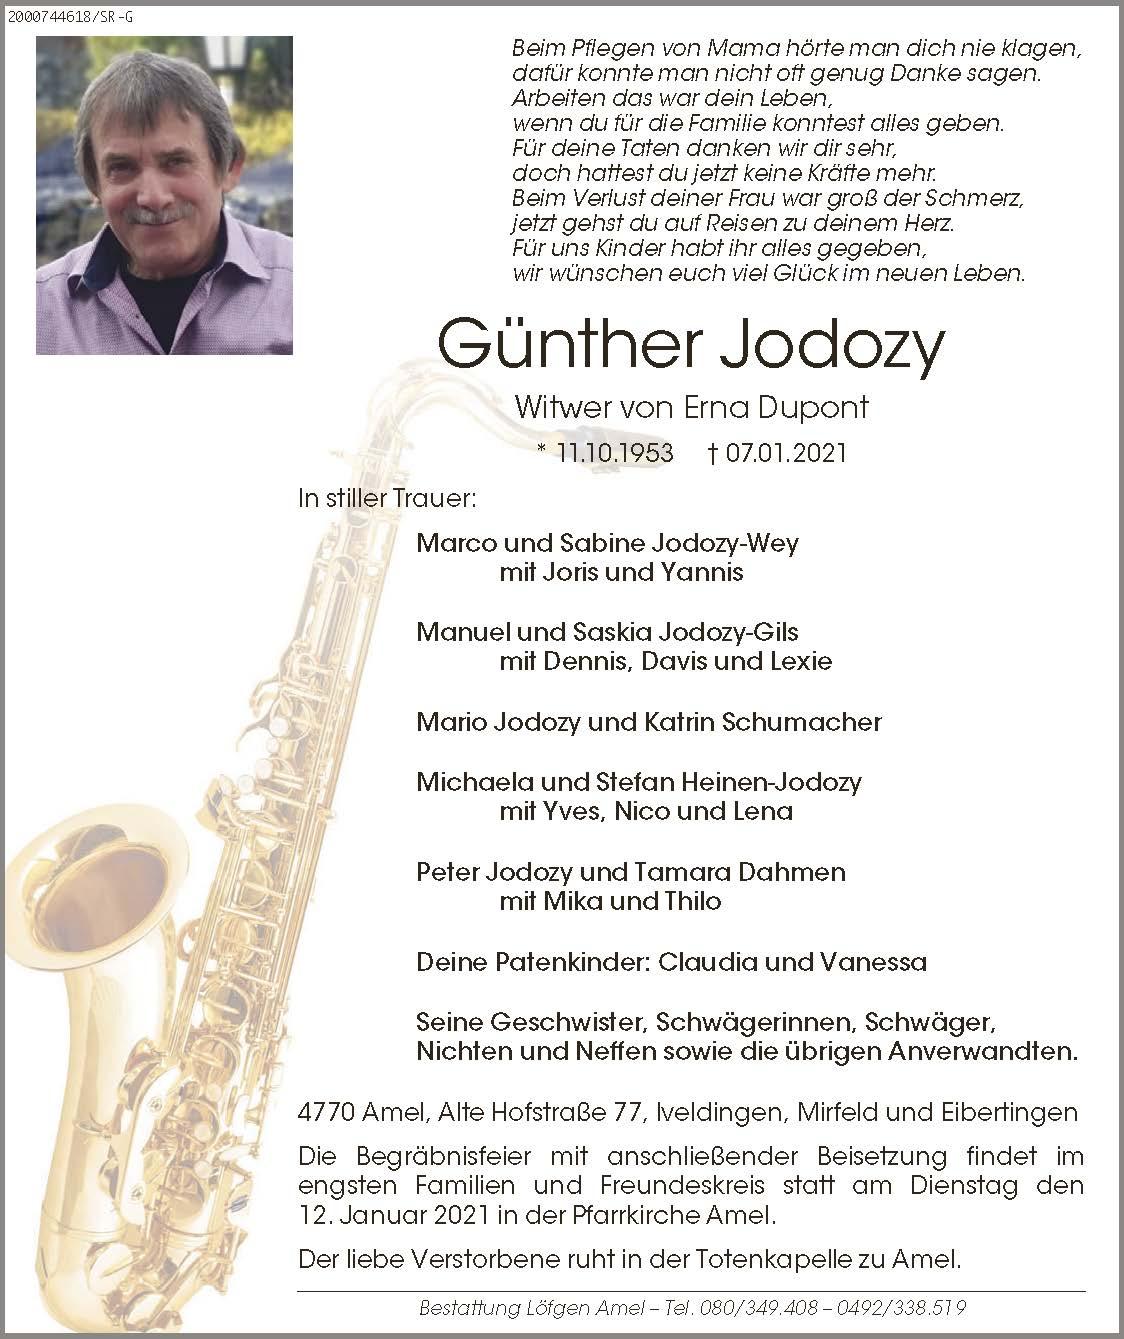 Günther Jodozy